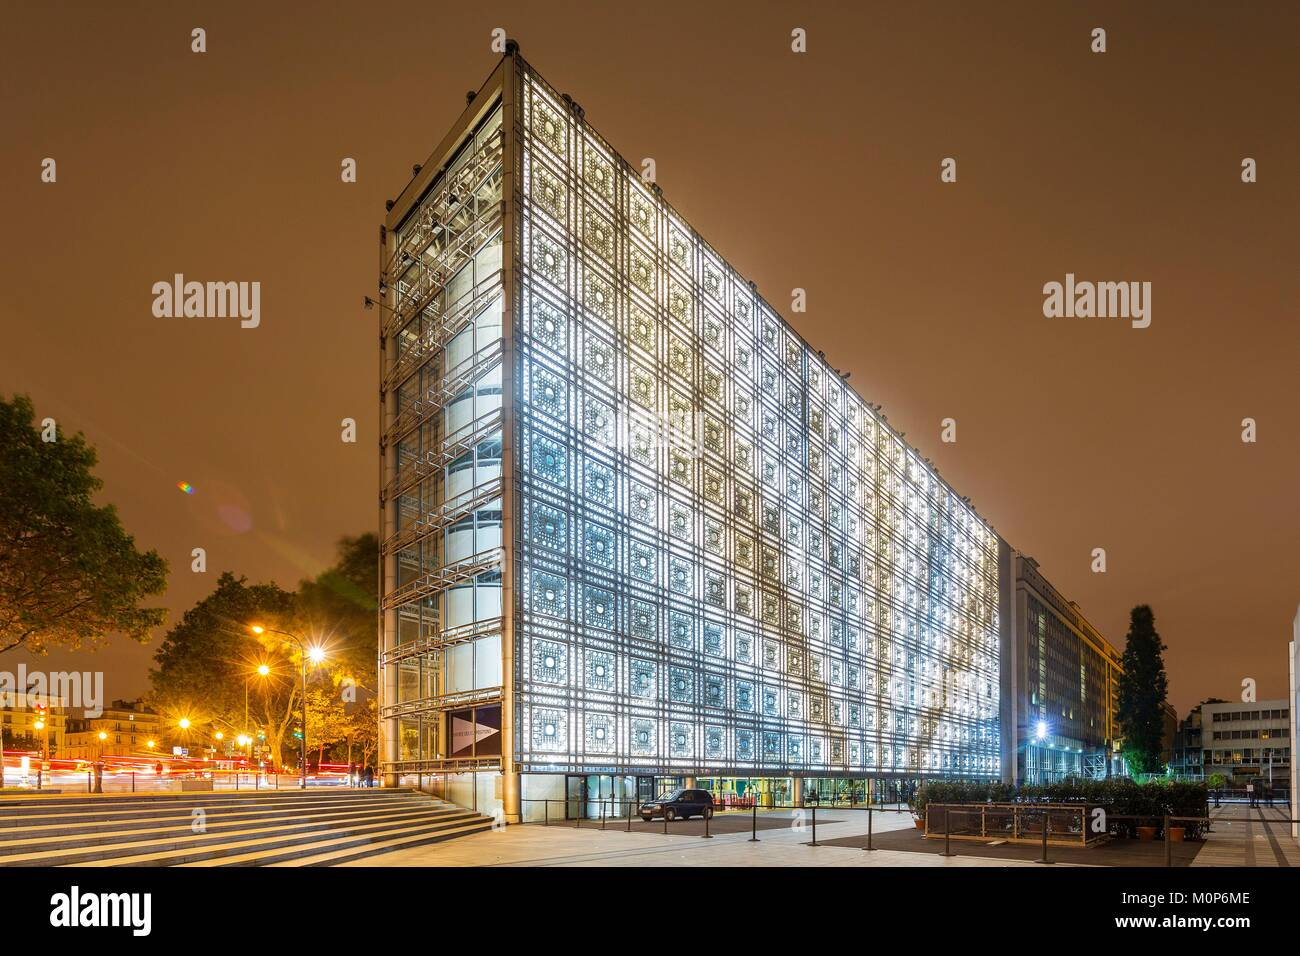 France,Paris,Institut du Monde Arabe (IMA),designed by the architects Jean Nouvel and Architecture-Studio,white - Stock Image